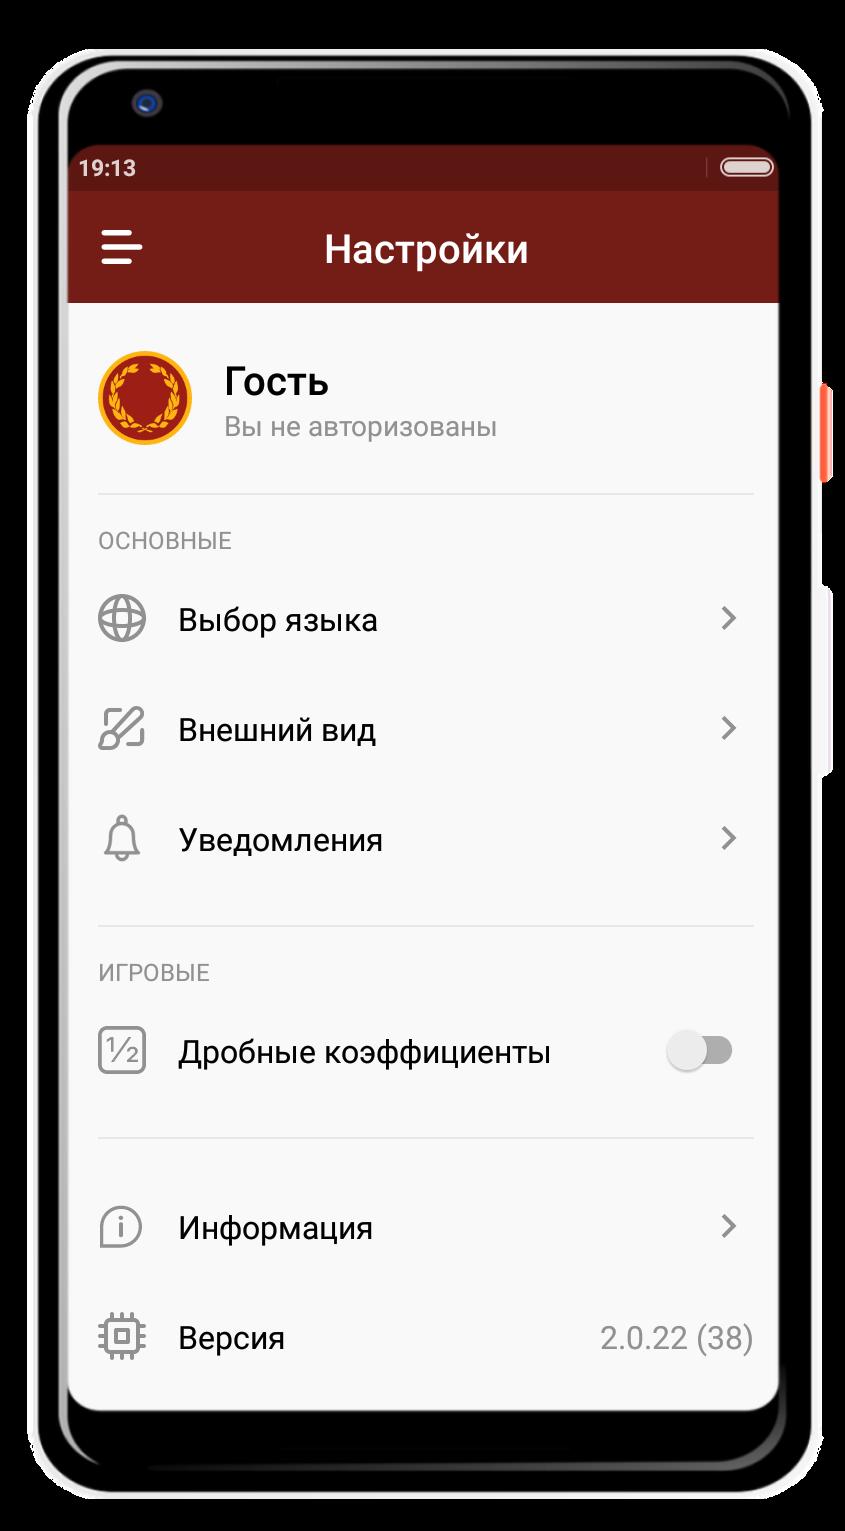 Настройки олимп бет андроид